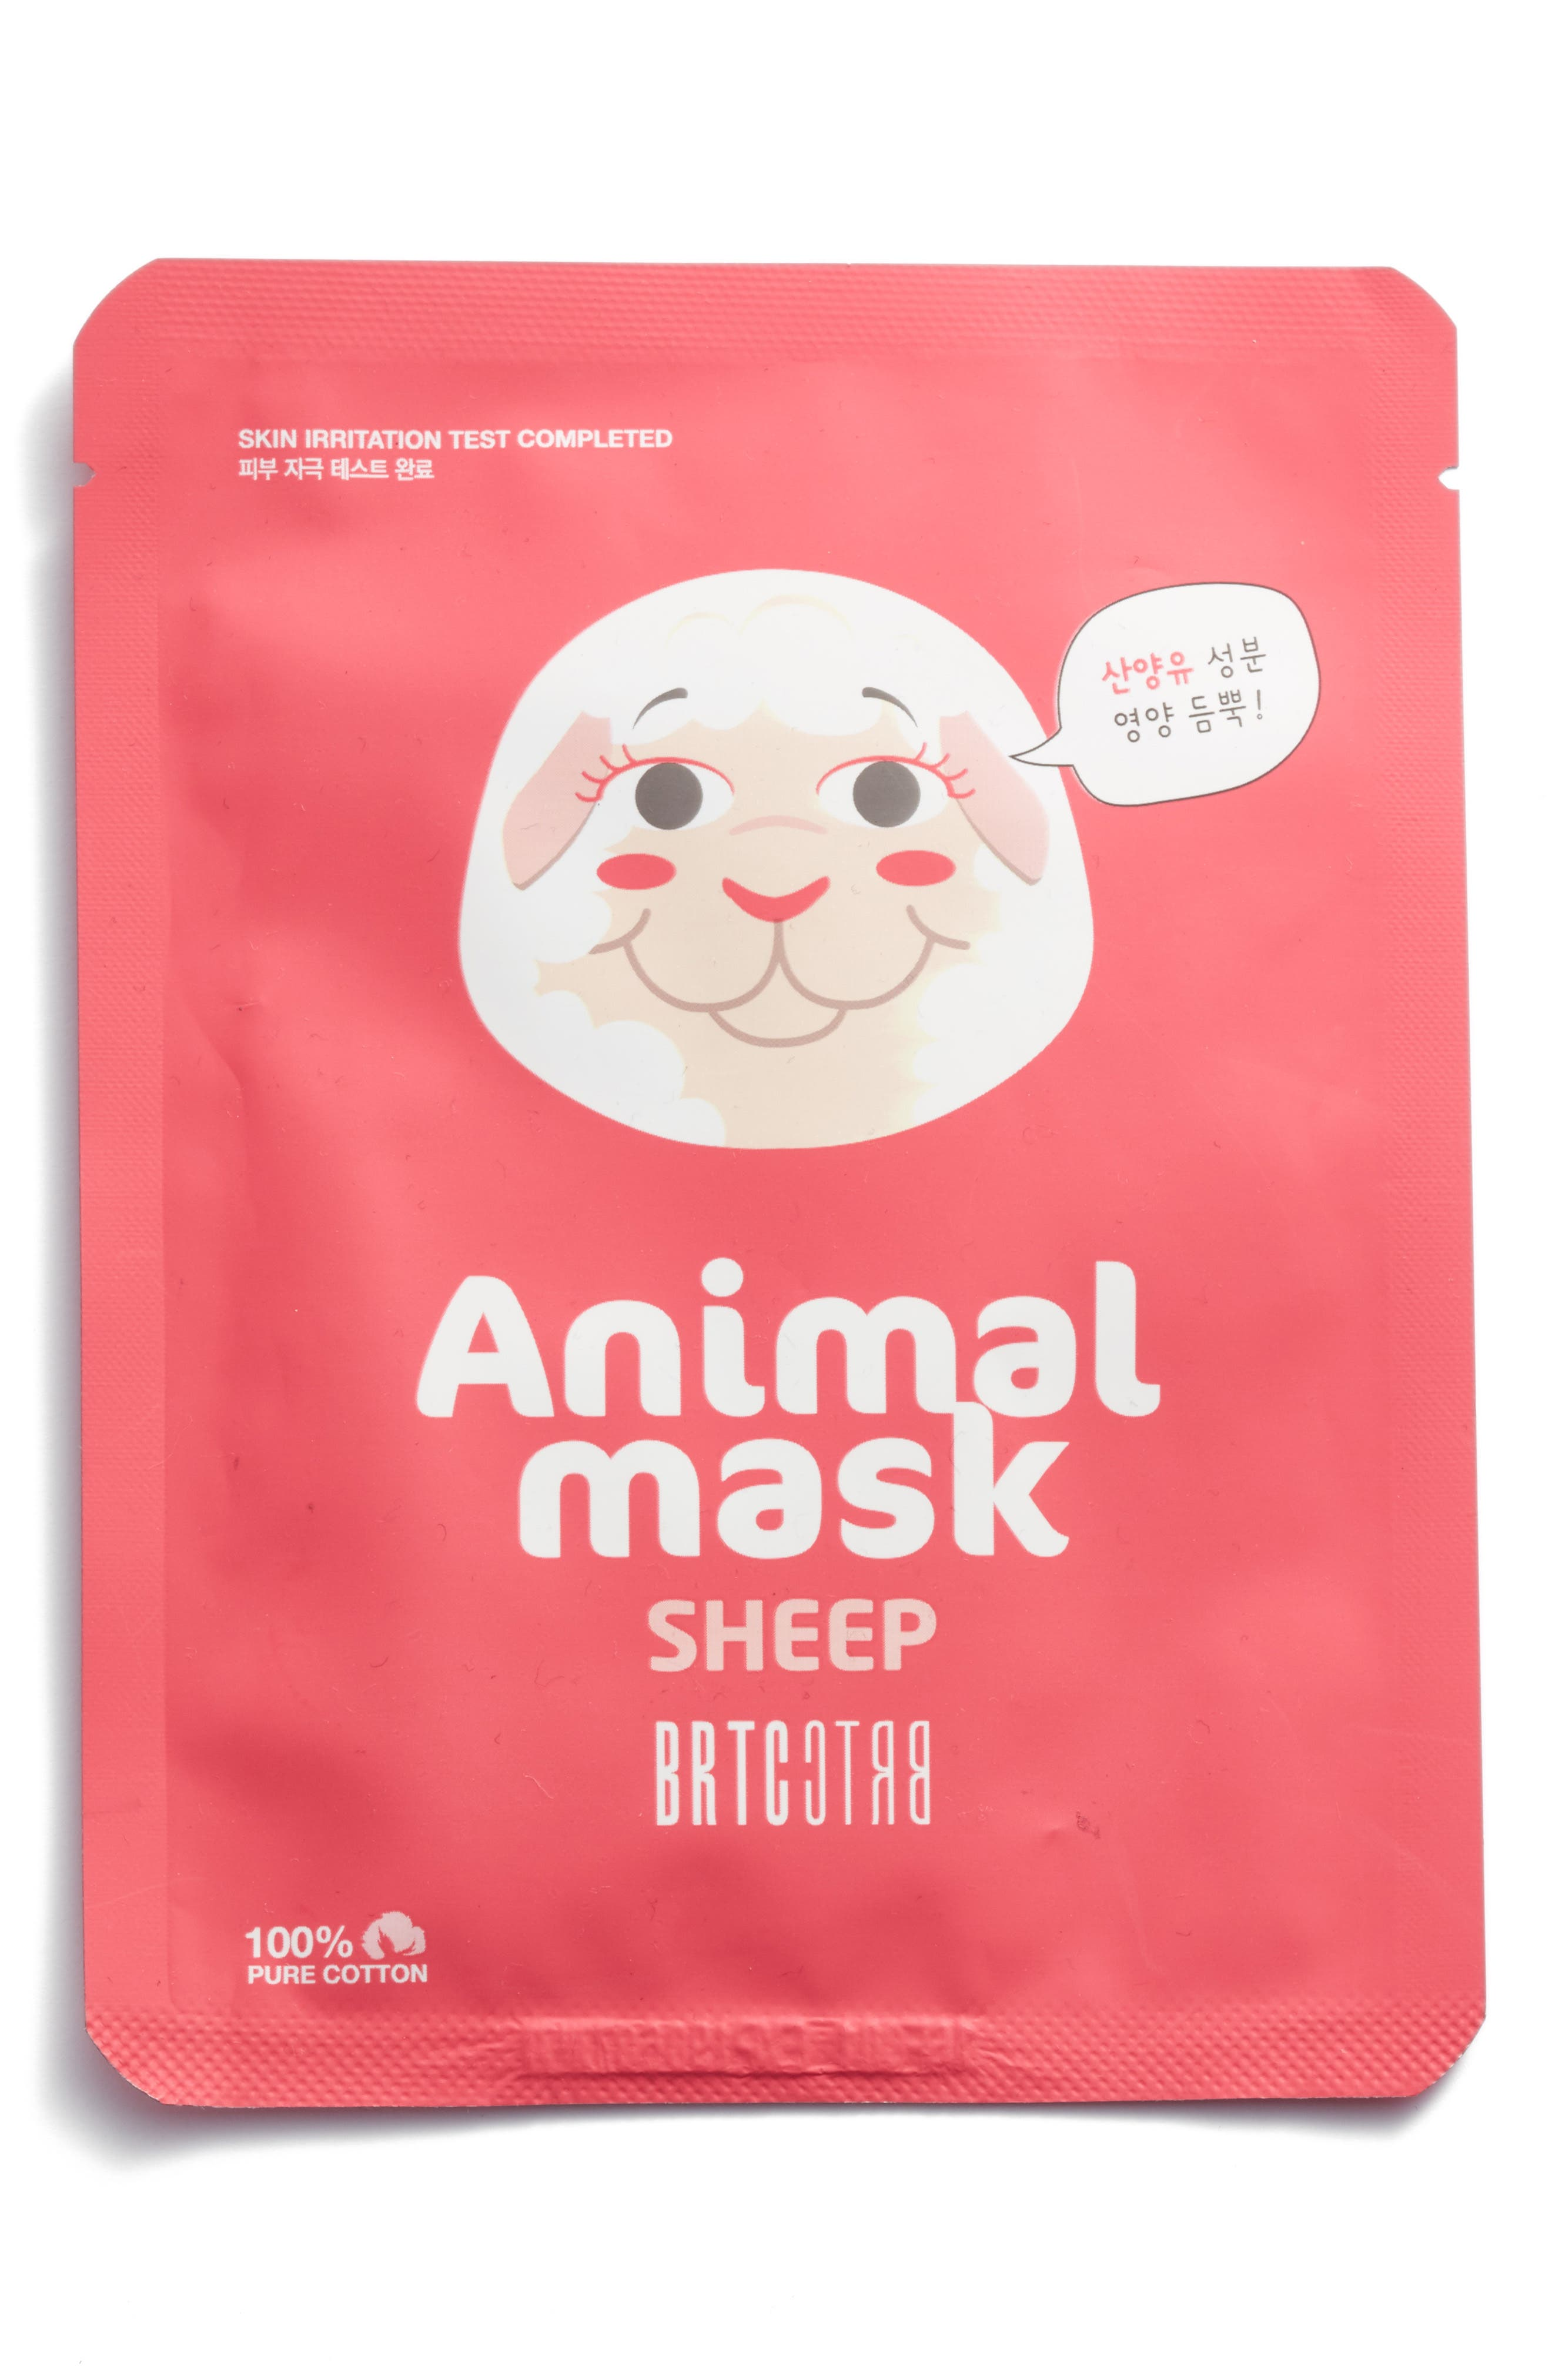 BRTC Animal Mask